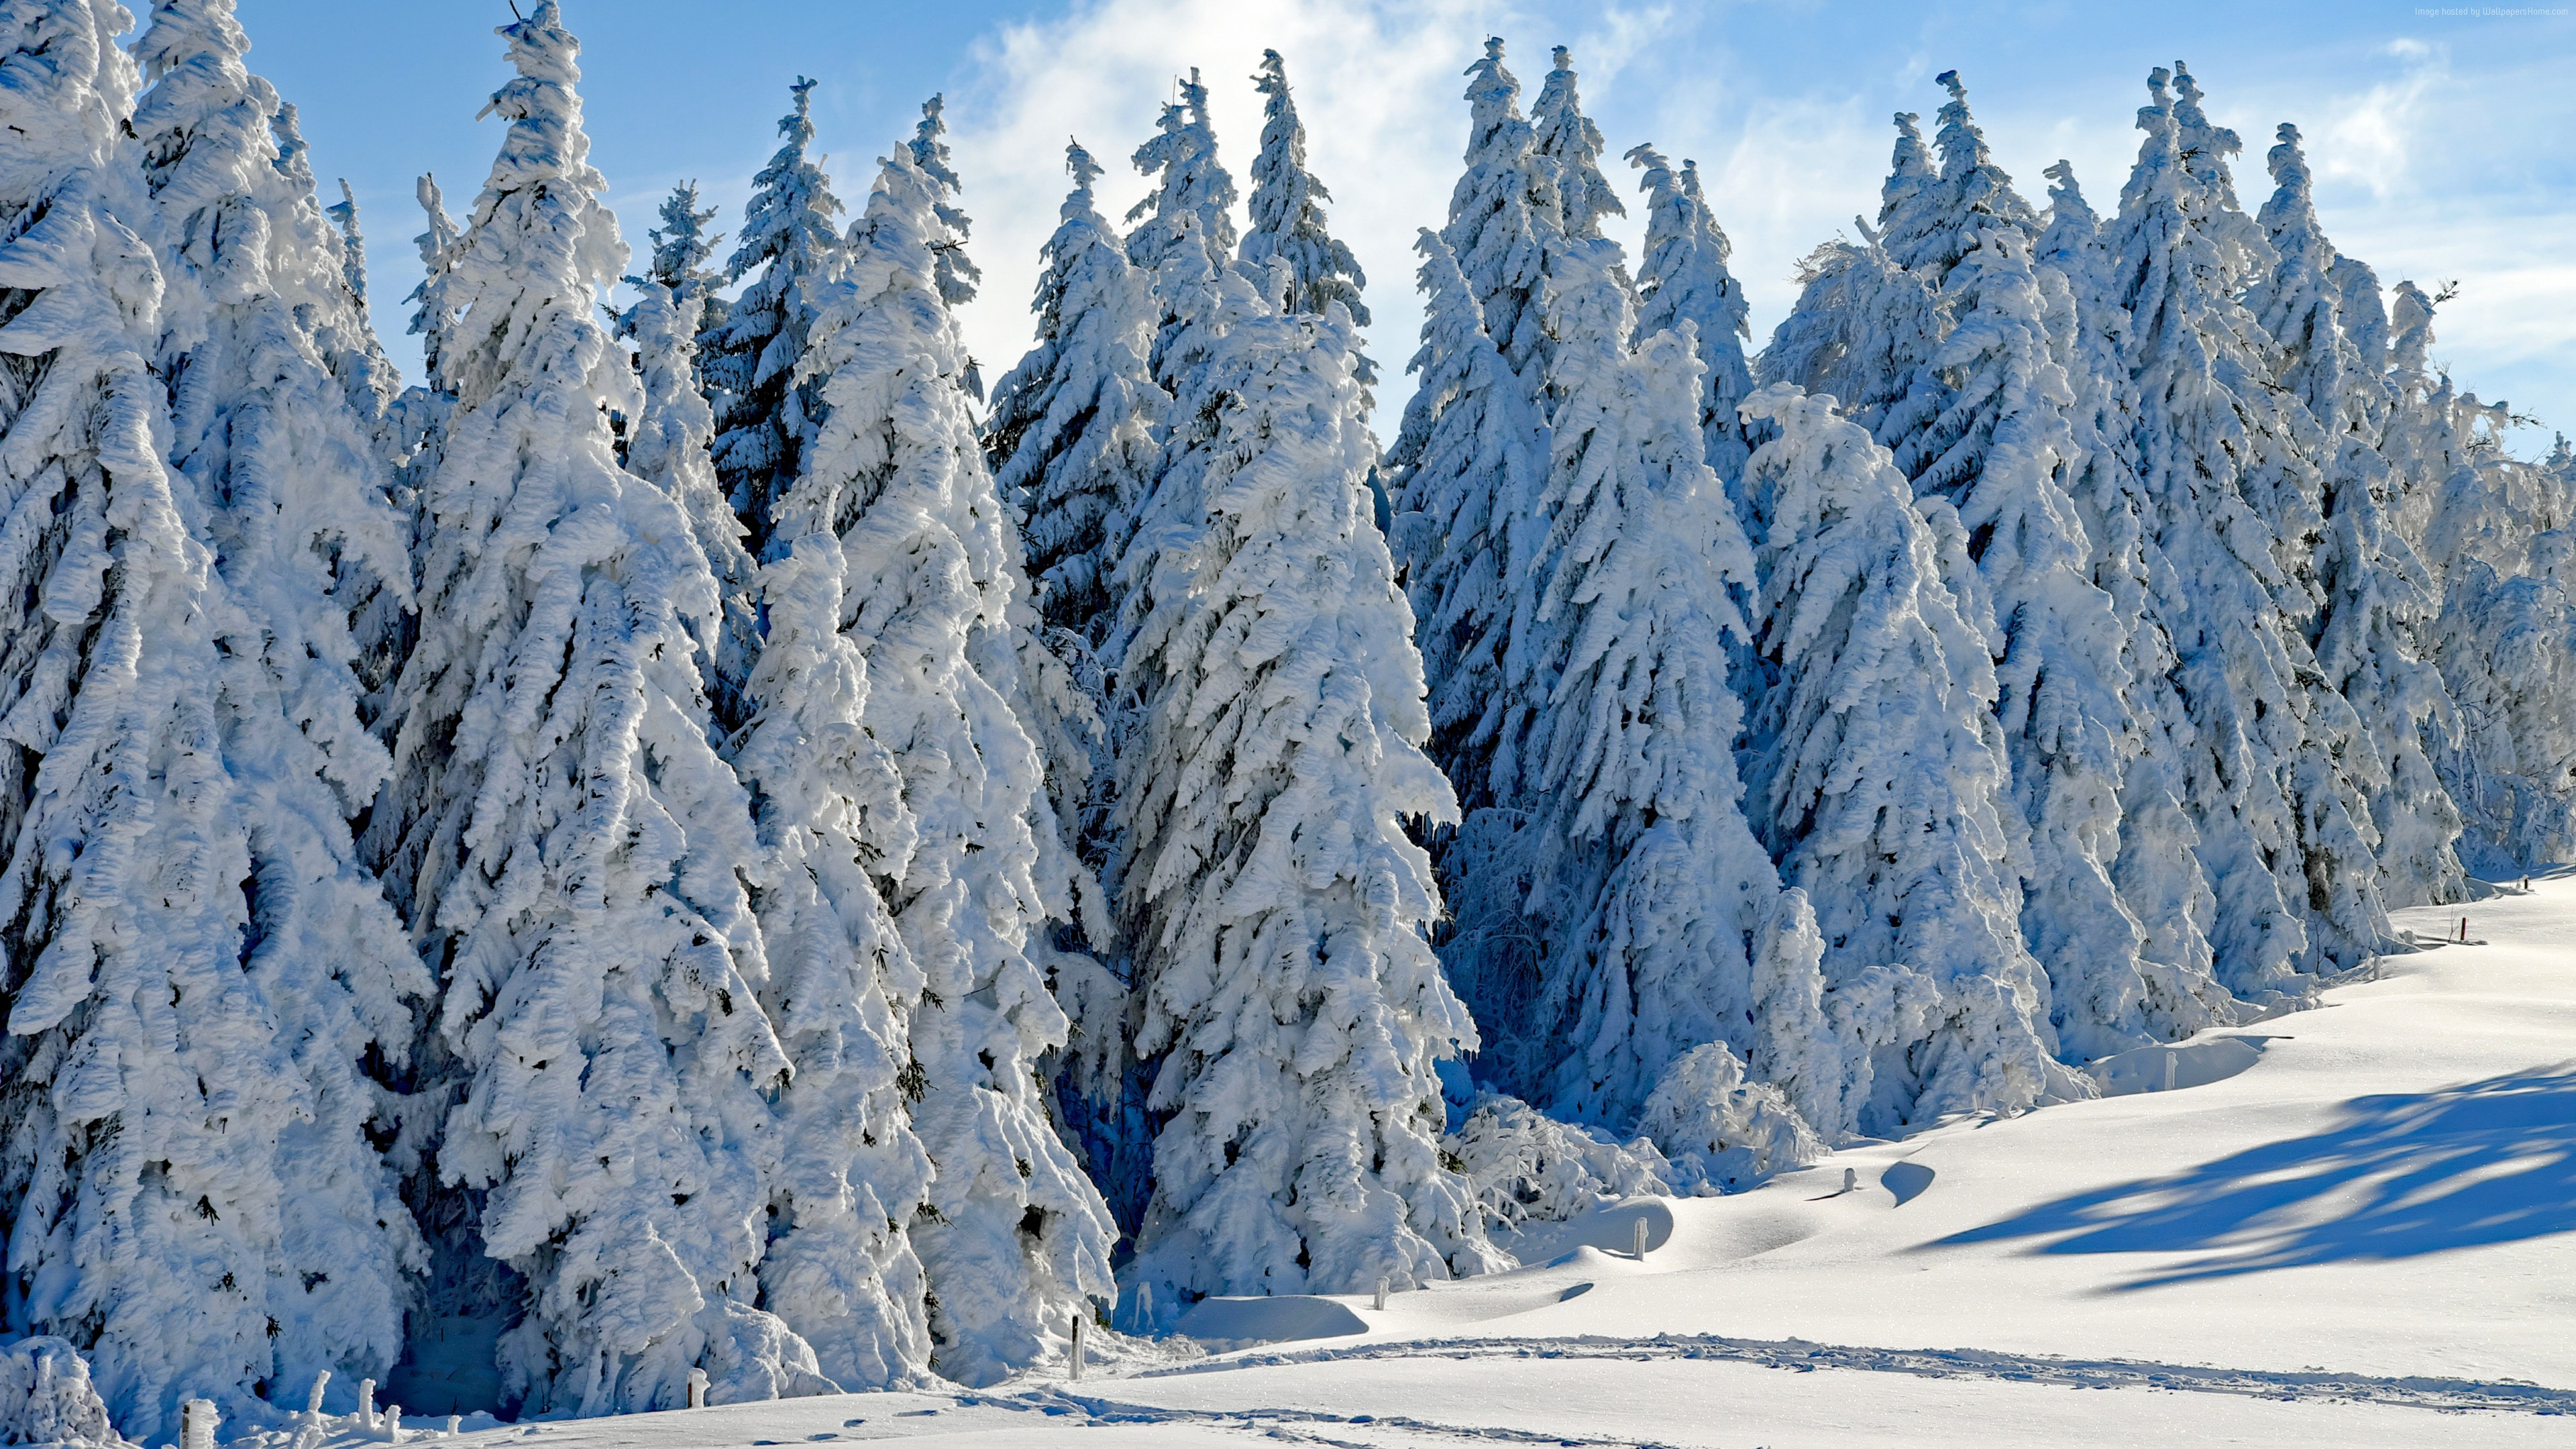 Wallpaper Forest Tree Snow Winter 4k Nature Wallpaper Download High Resolution 4k Wallpaper